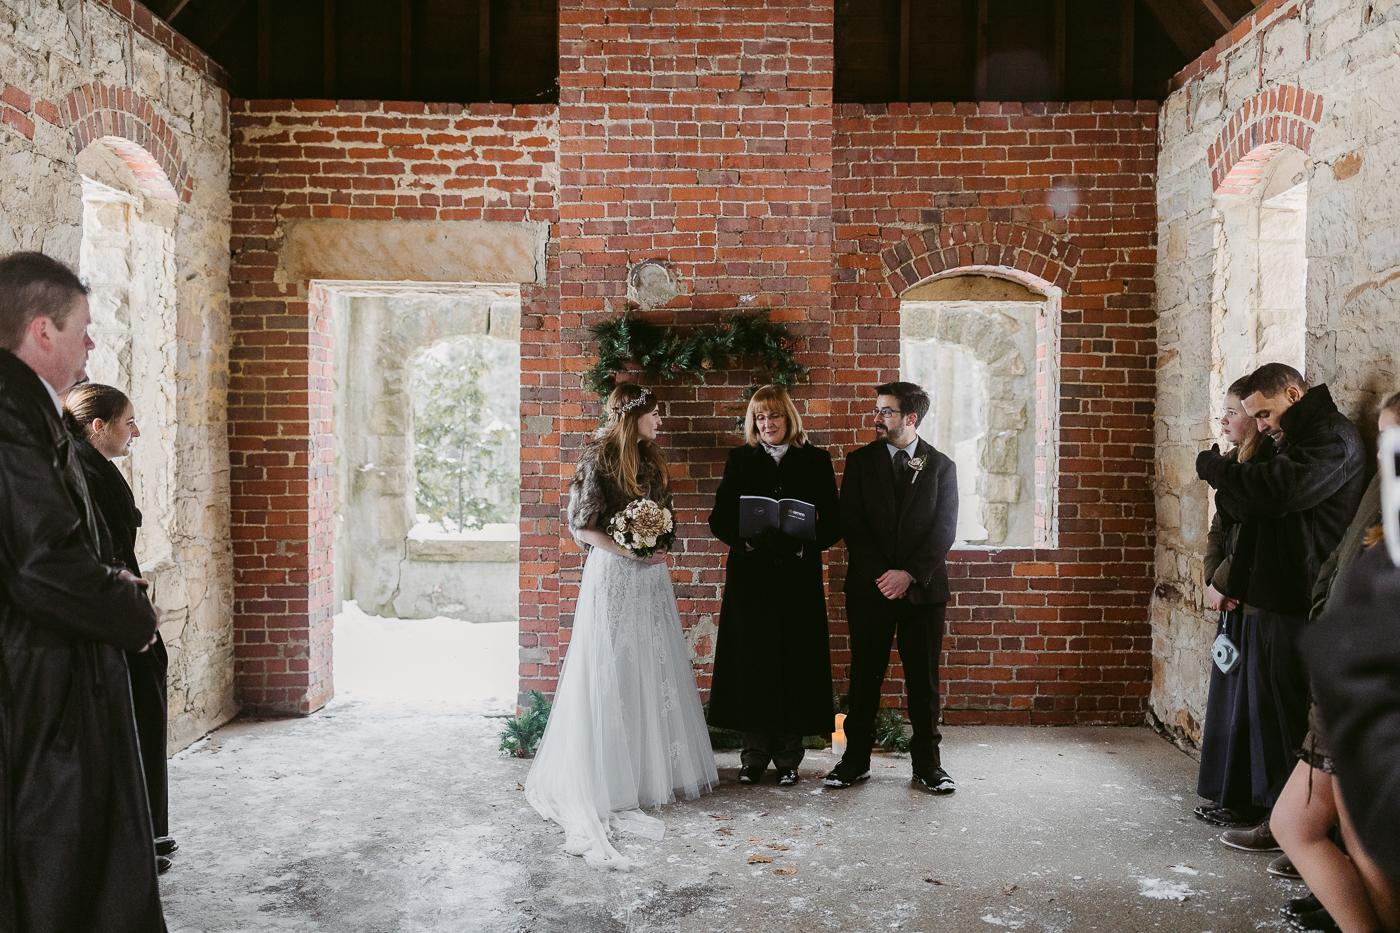 Squires-Castle-Winter-Wedding-23.jpg